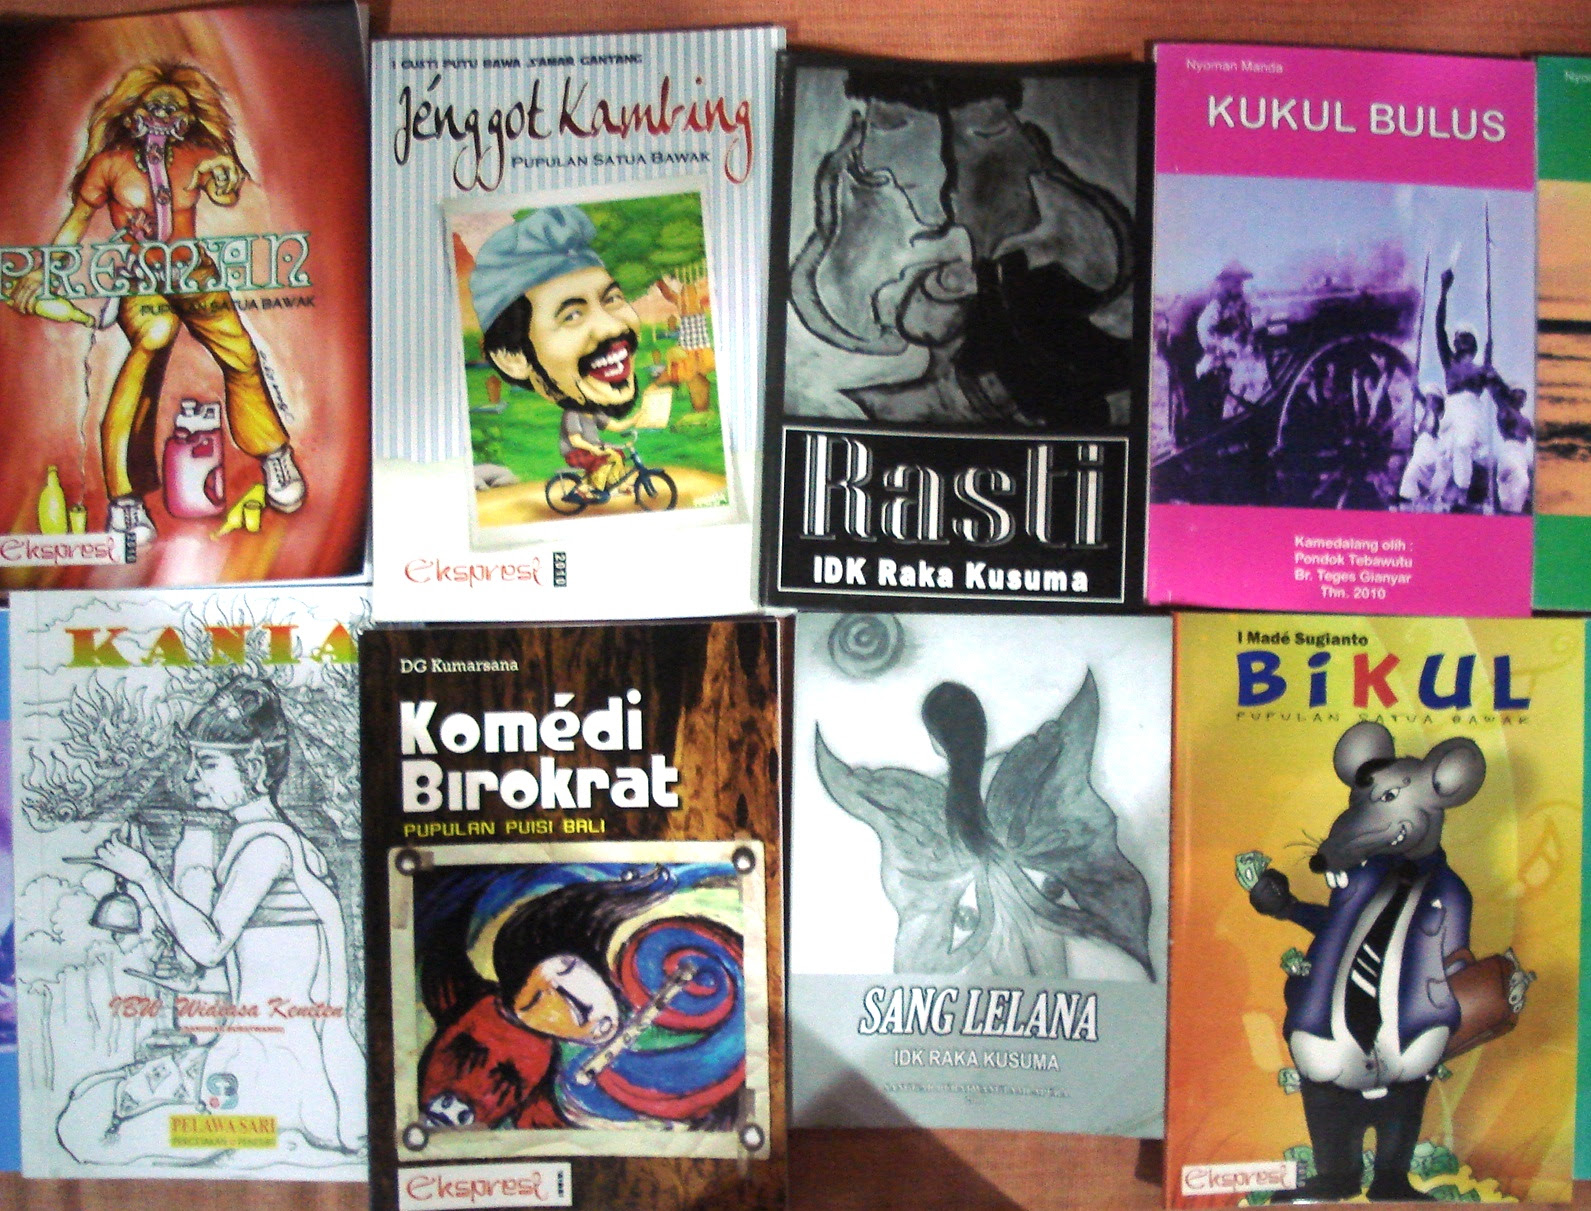 Kumpulan Cerita Lucu: Contoh Cerpen Bahasa Bali Tentang ...